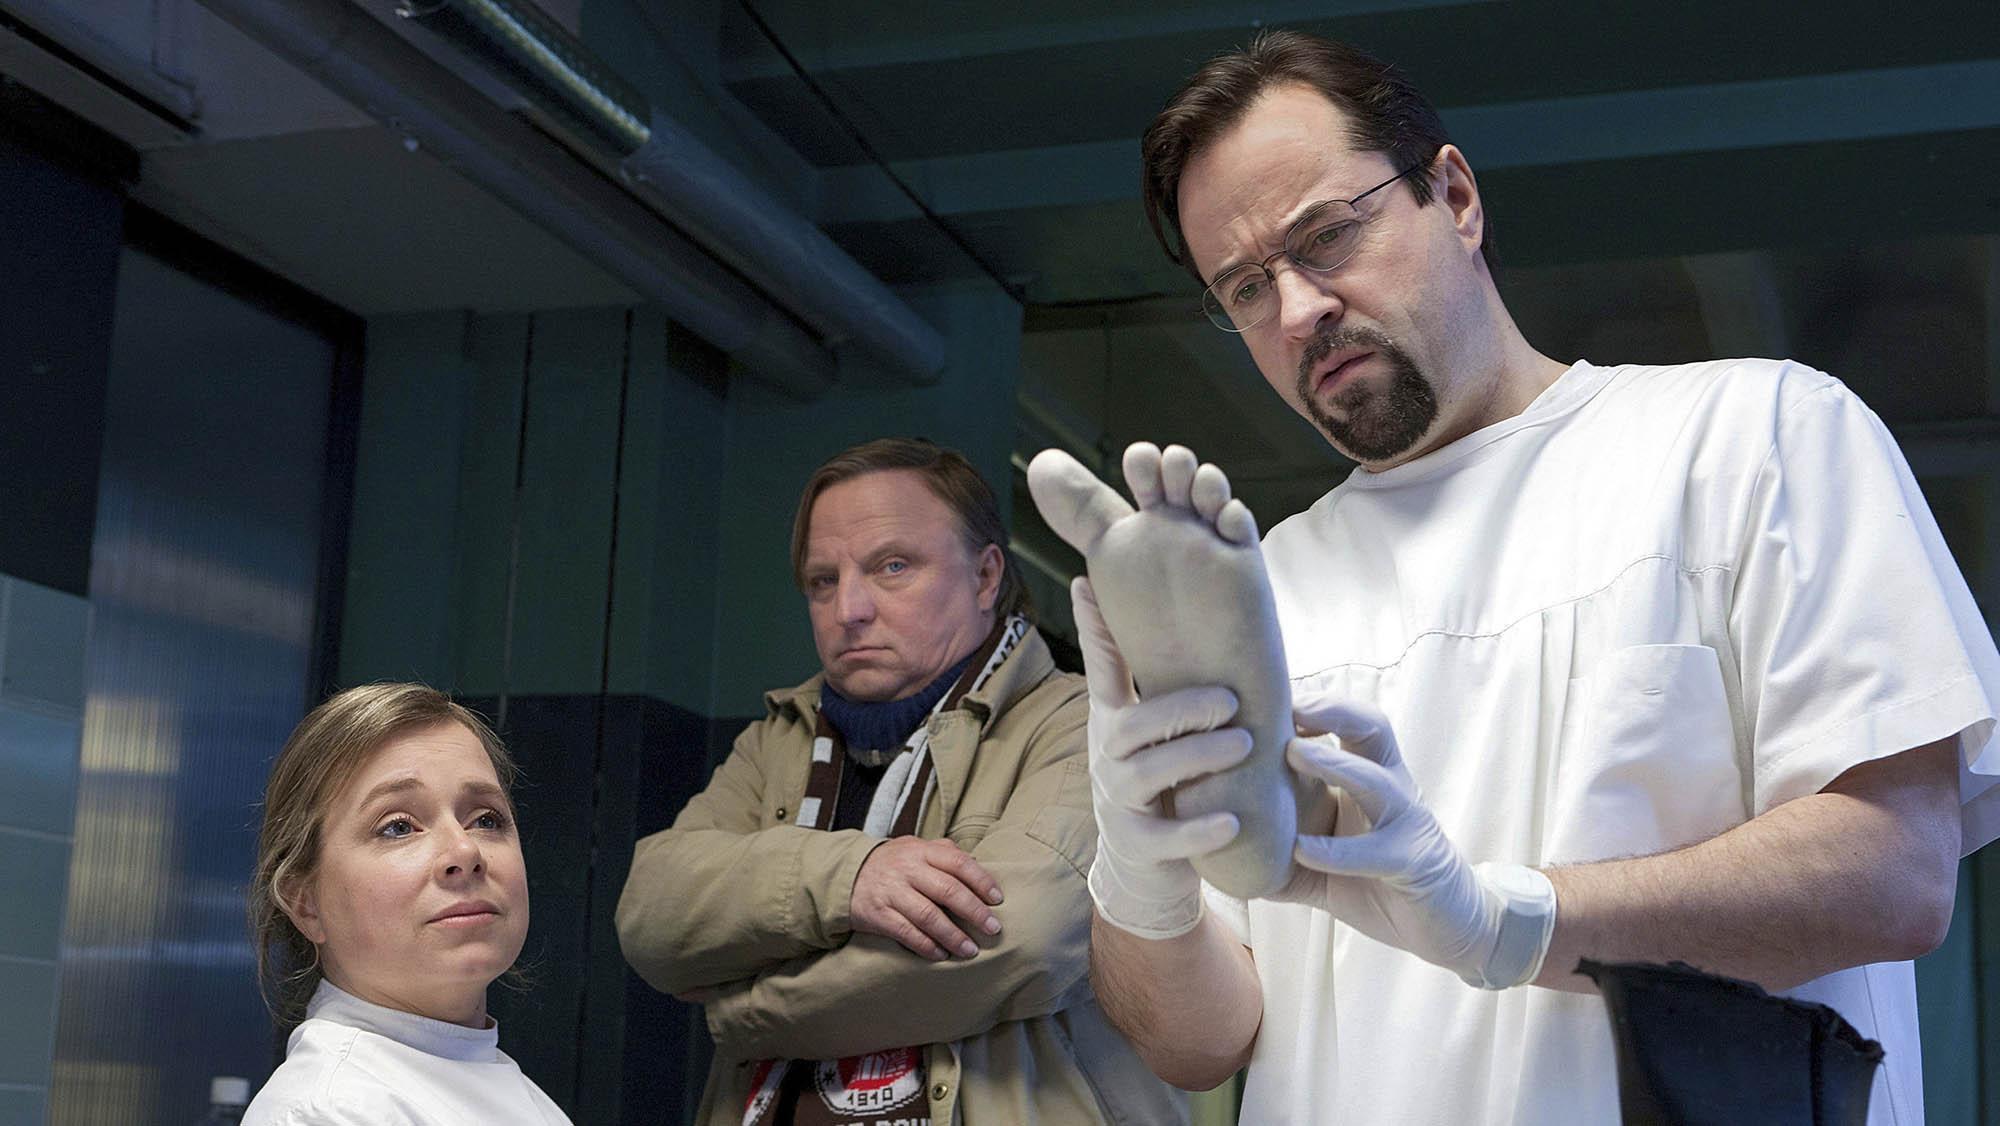 tatort_experiment_wdr Voting: Soll es weniger Experimente beim Tatort geben?